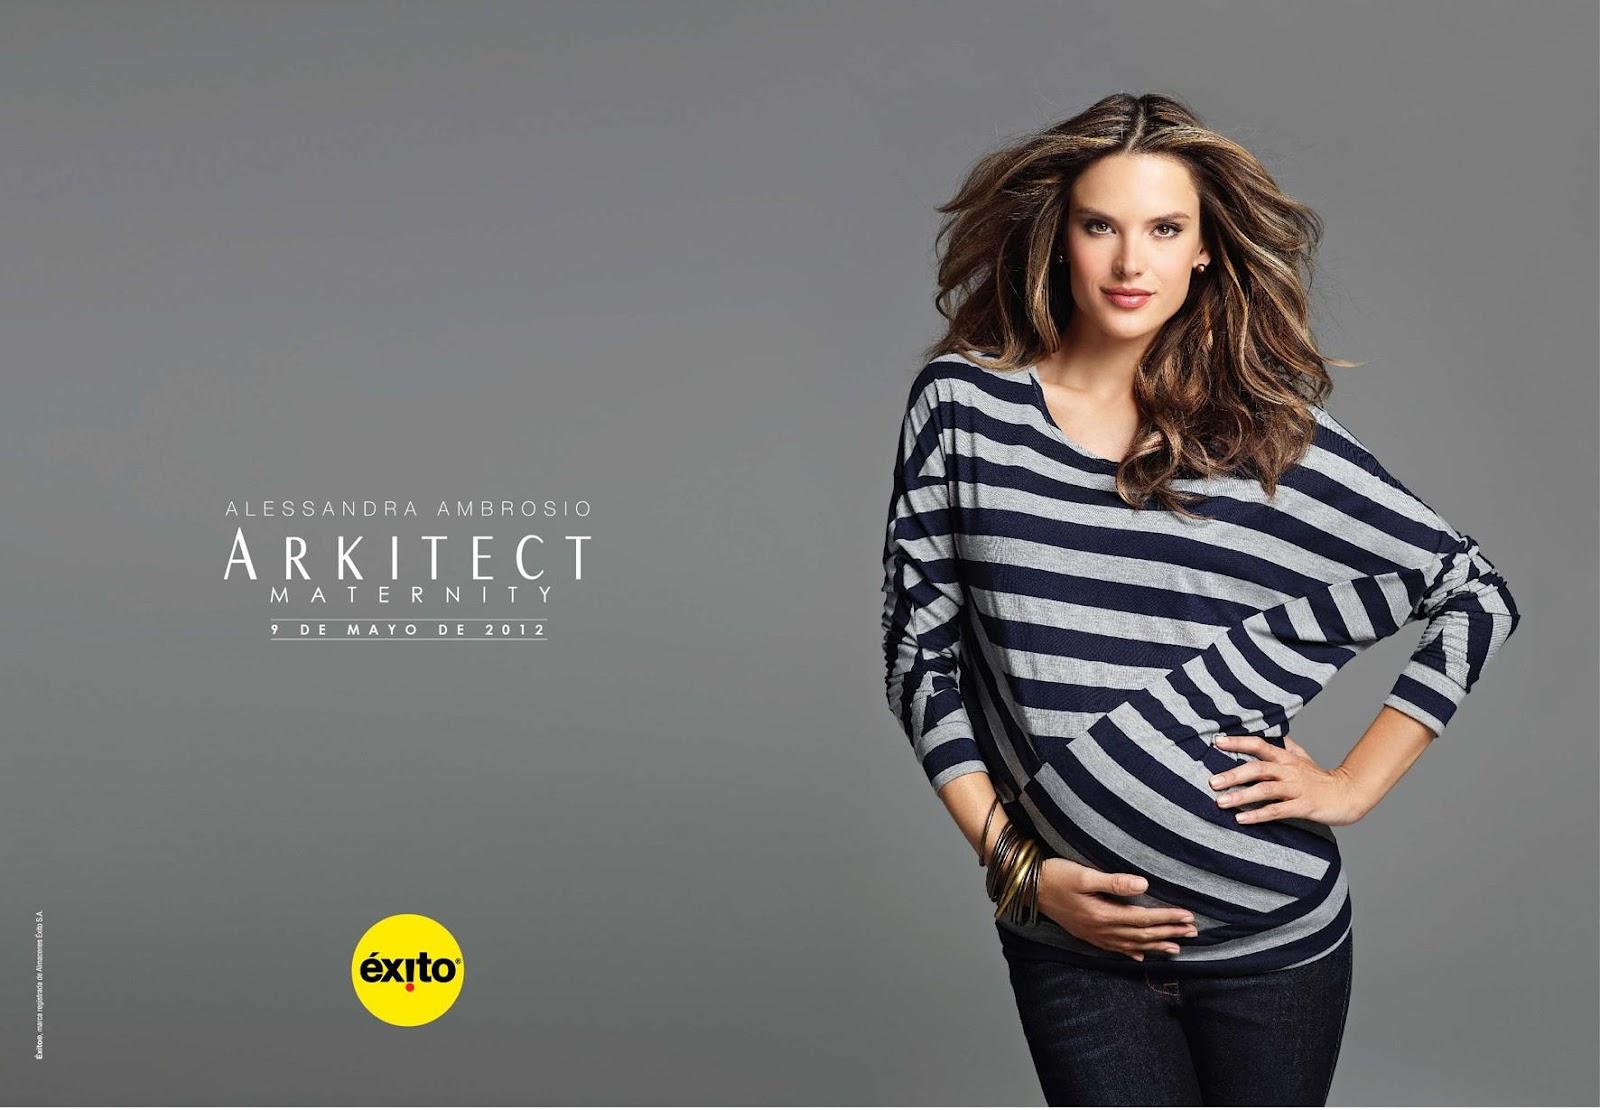 http://3.bp.blogspot.com/-0tofWK2Xpec/T5nLLrTxFwI/AAAAAAAAIbs/VbpGiD0XCF8/s1600/Arkitect+Maternity.jpg